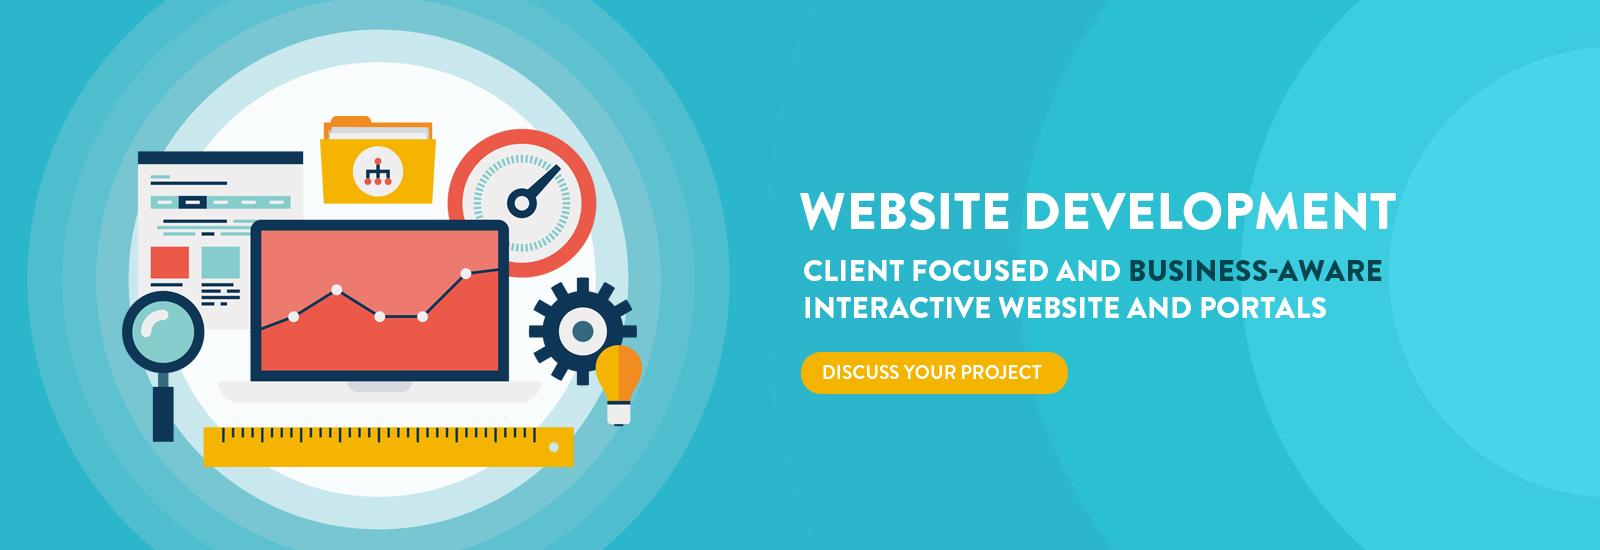 web design and development in rohtak